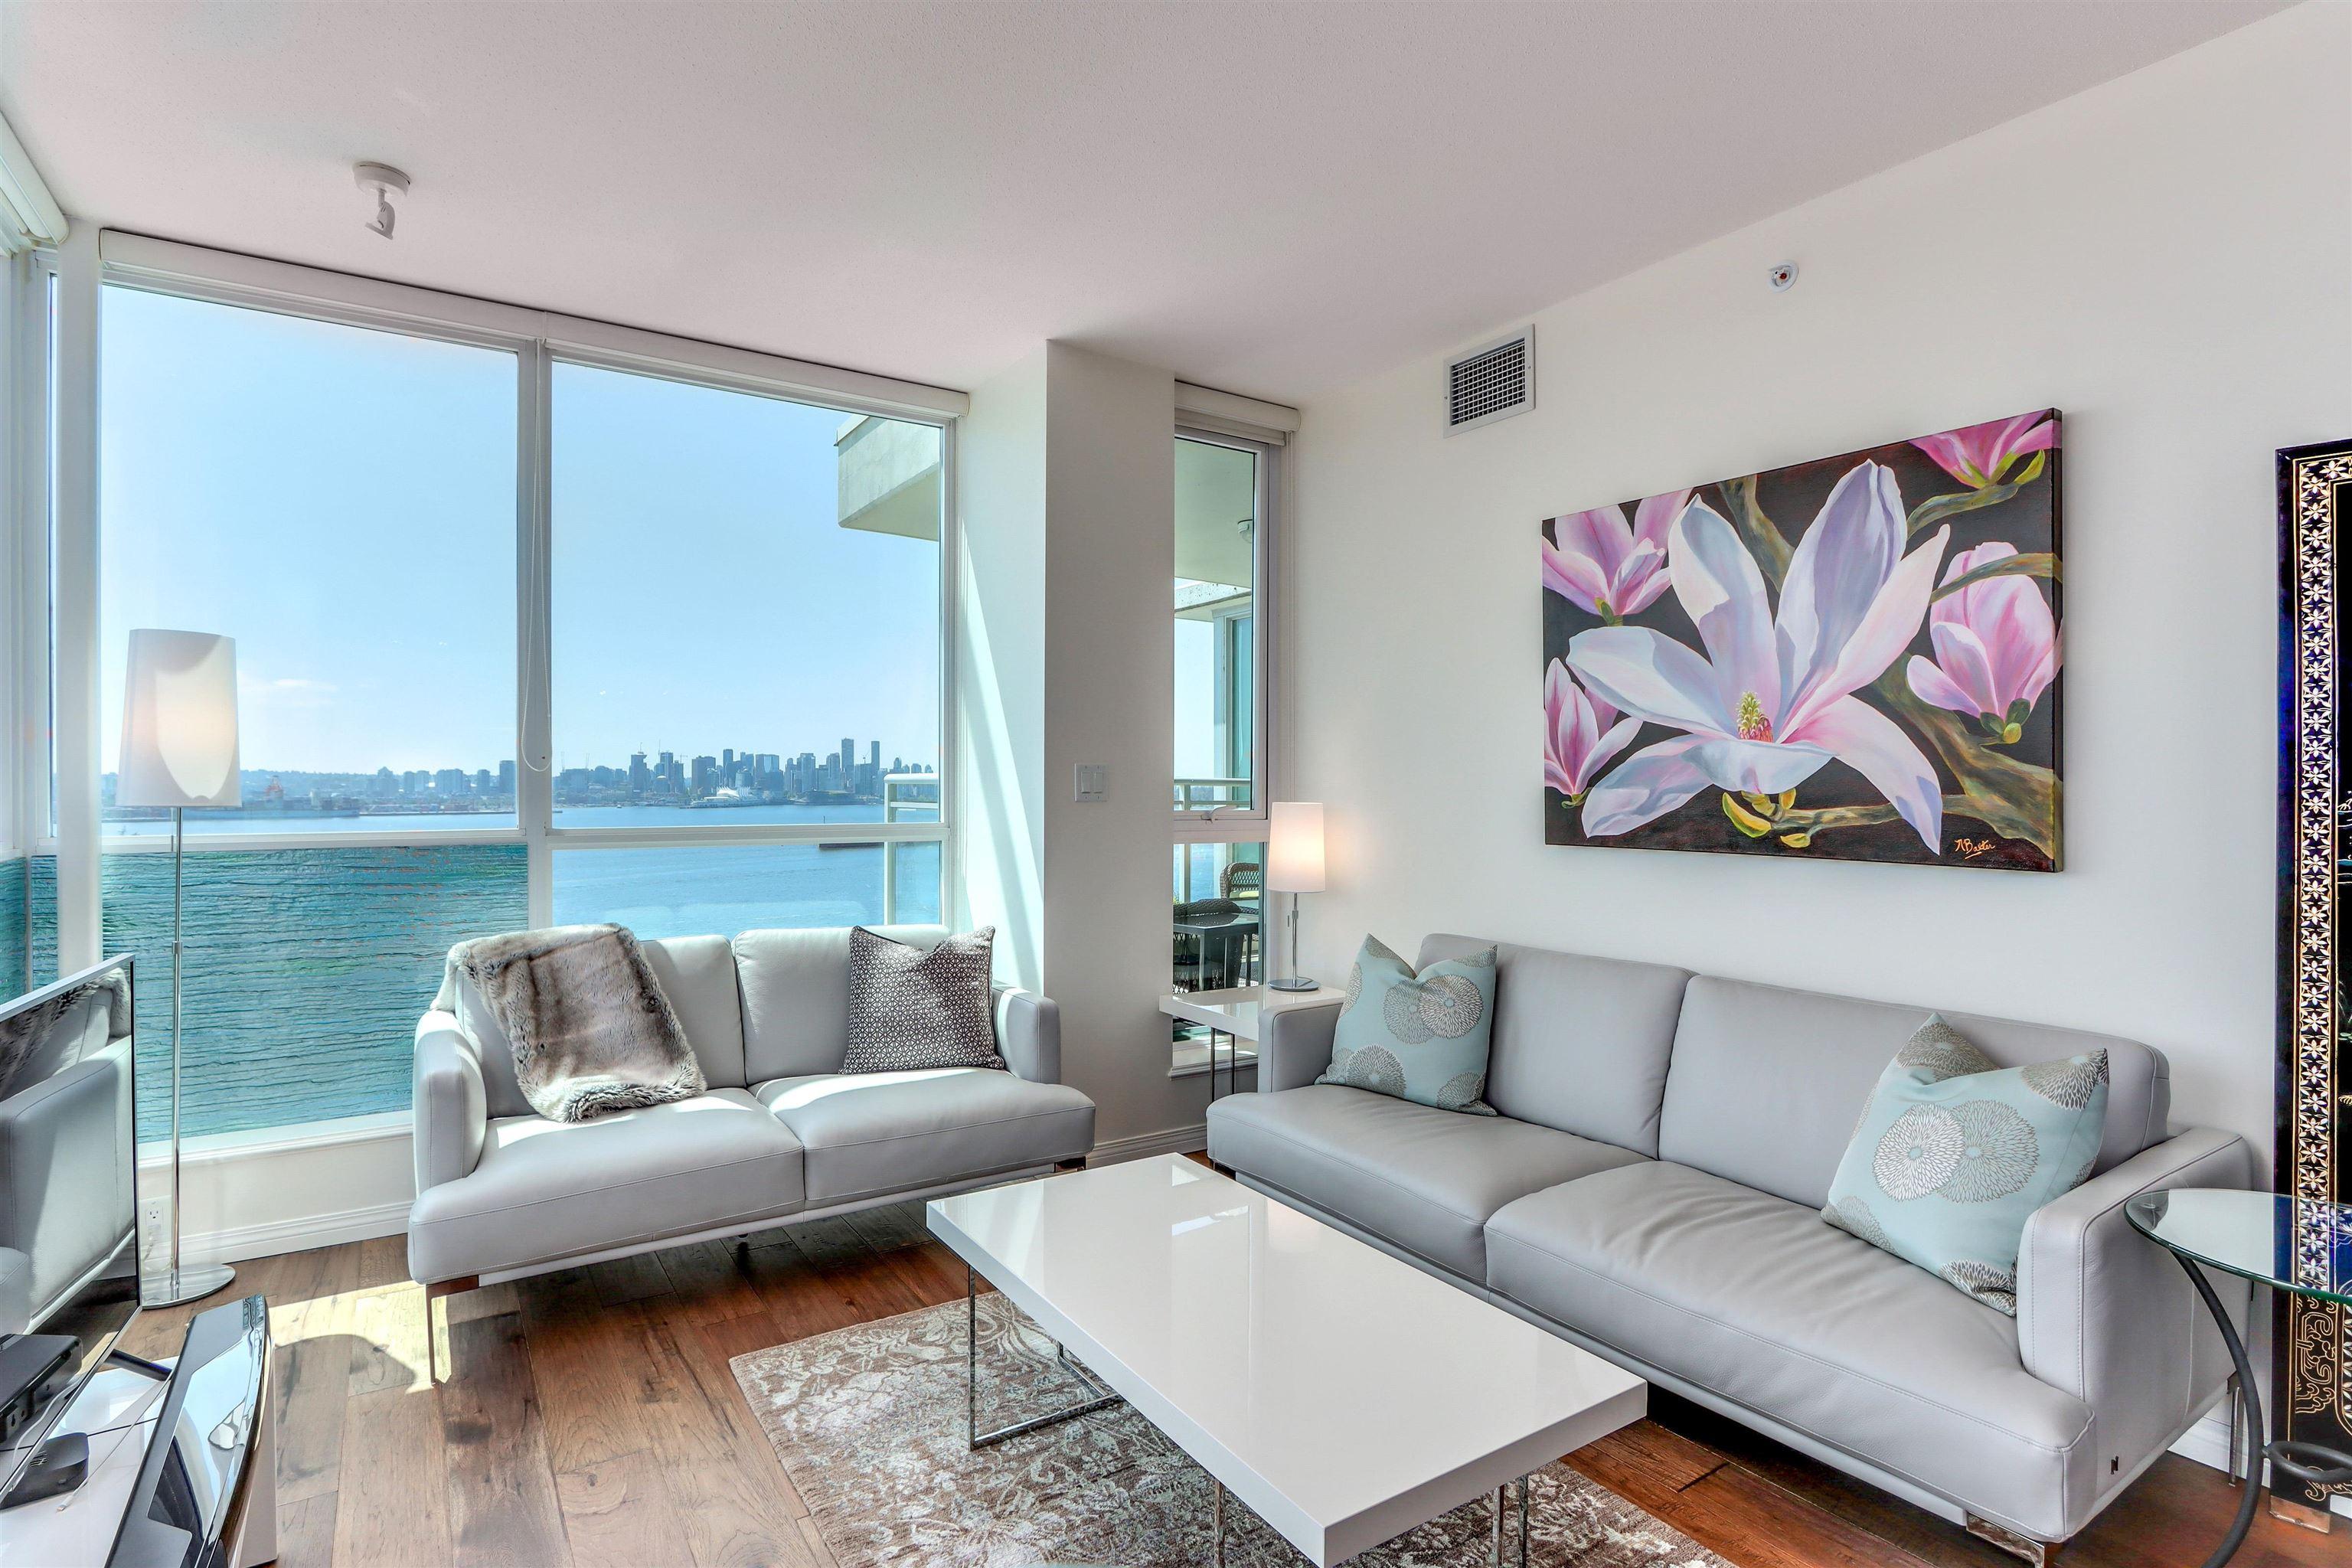 2202 188 E ESPLANADE - Lower Lonsdale Apartment/Condo for sale, 2 Bedrooms (R2618412) - #10